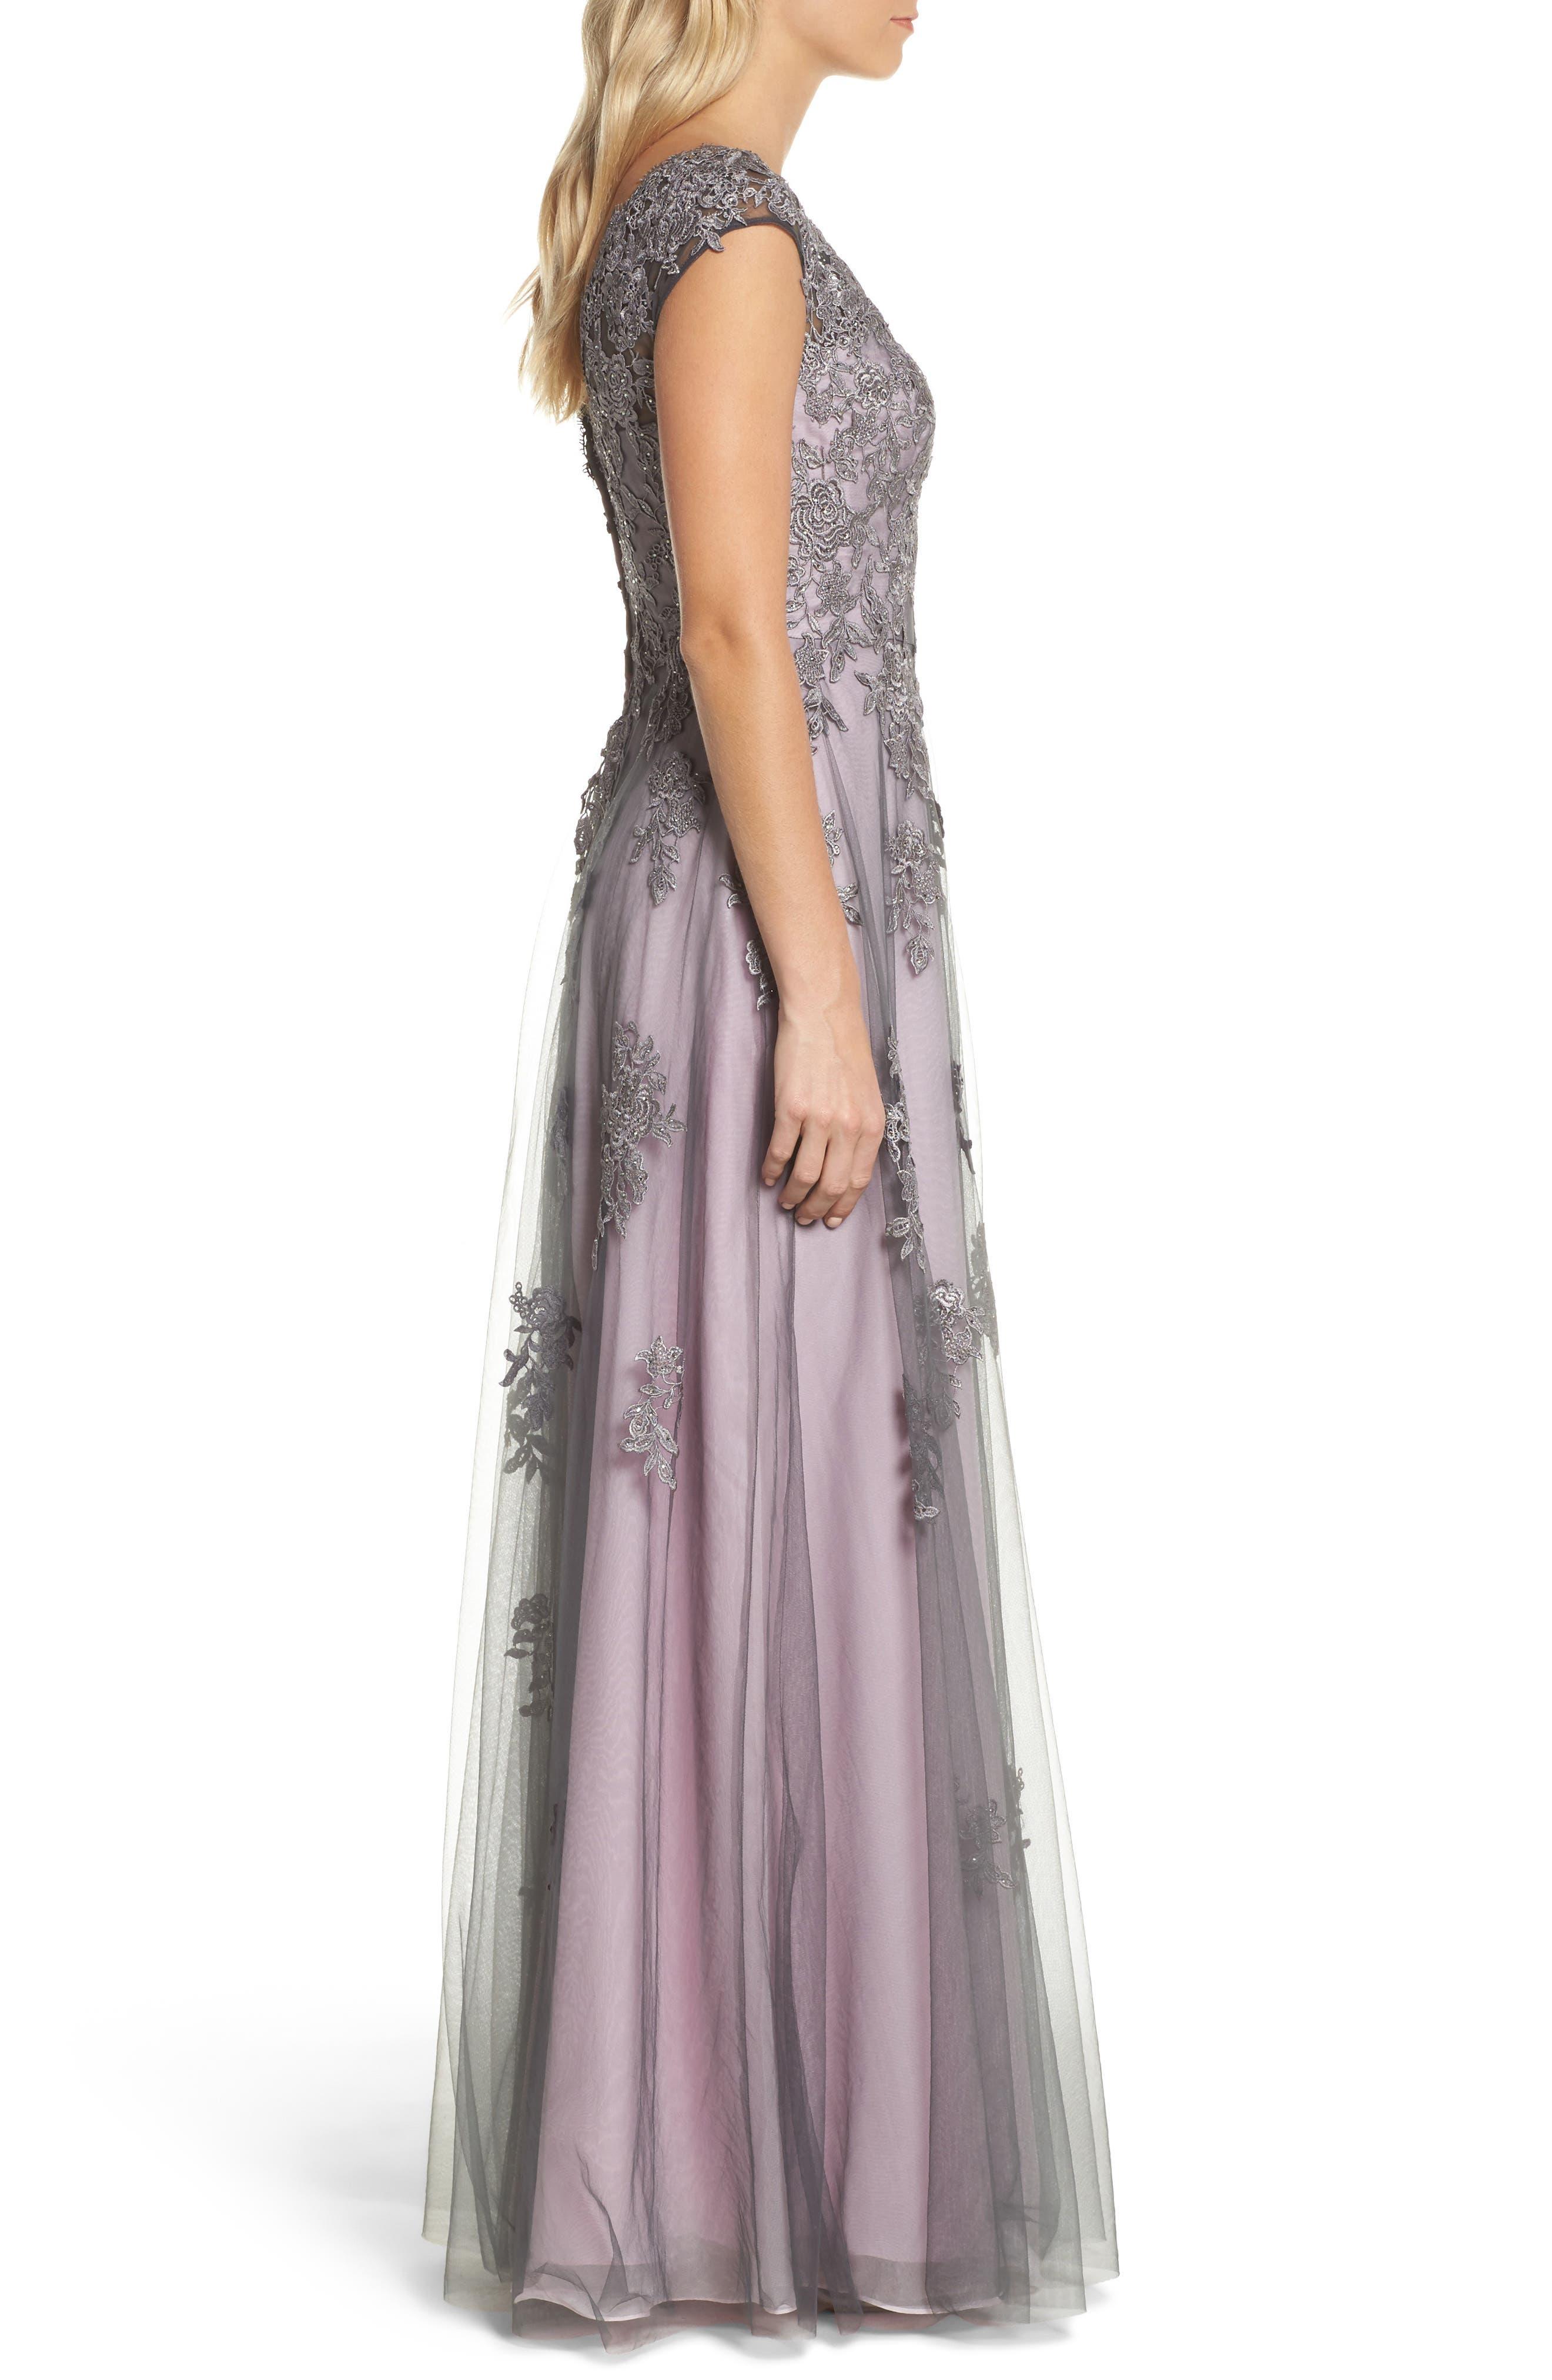 LA FEMME, Embellished Mesh A-Line Gown, Alternate thumbnail 3, color, PINK/ GRAY